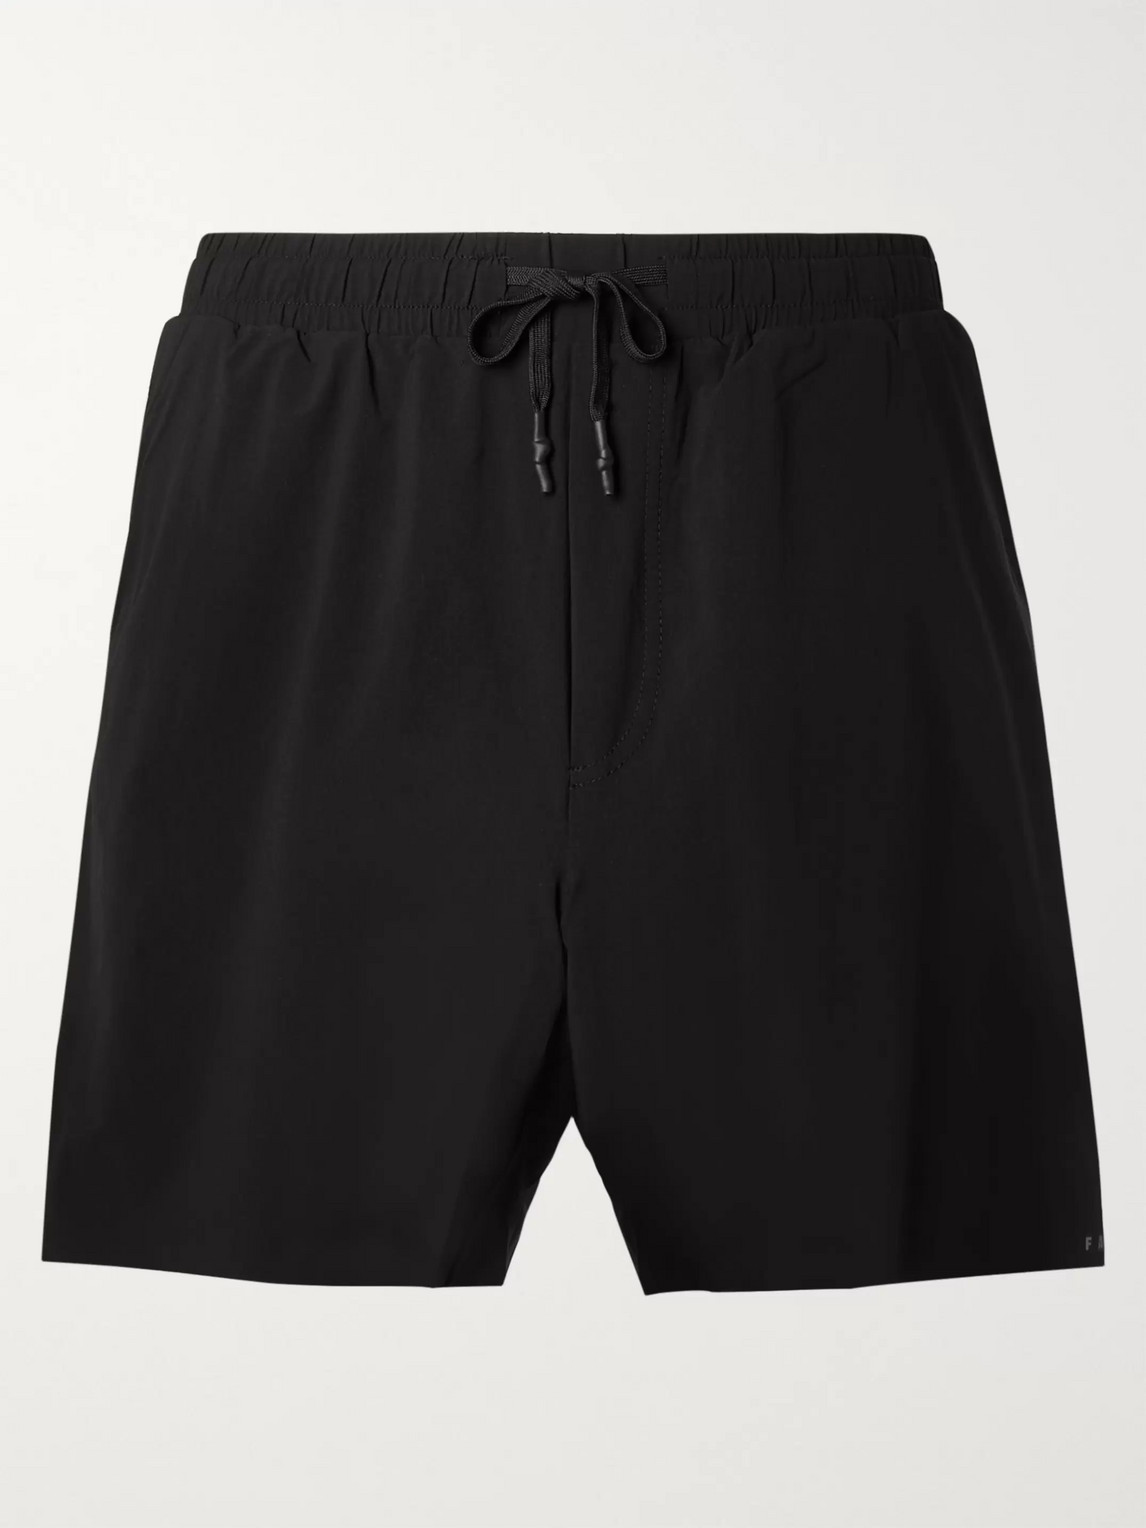 falke ergonomic sport system - challenger slim-fit drawstring stretch-shell shorts - men - black